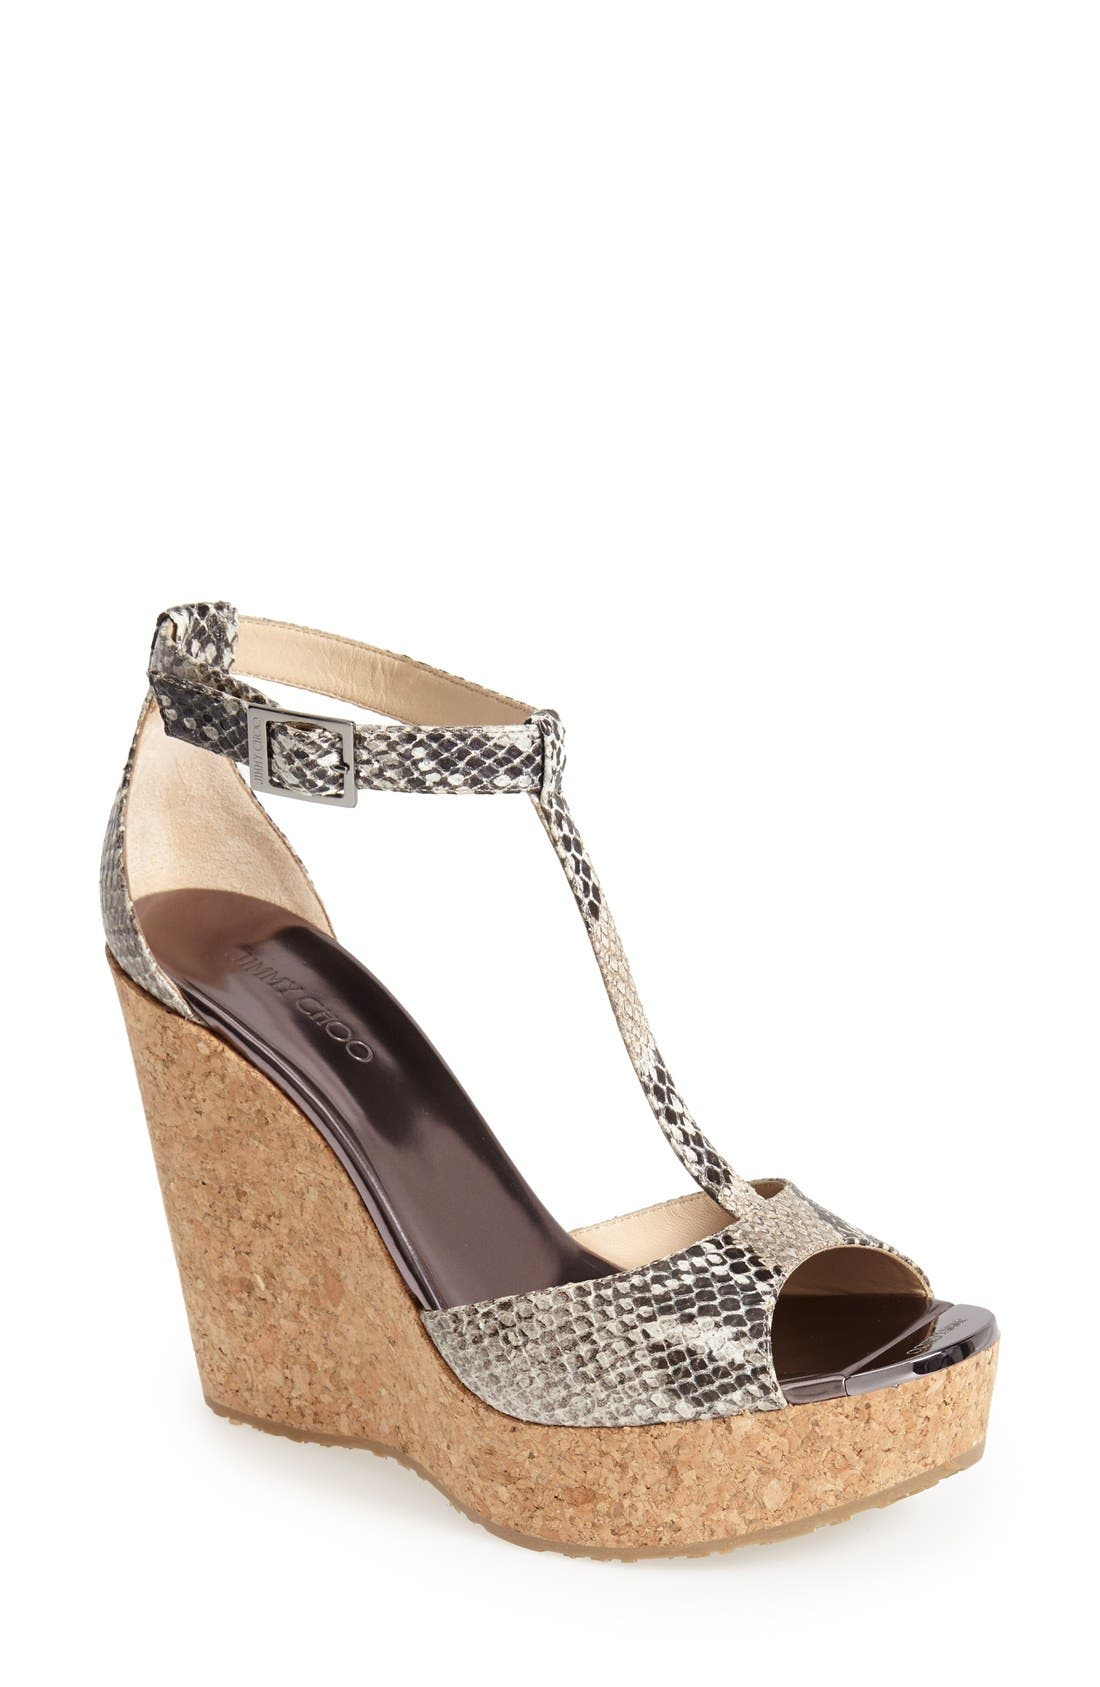 Alternate Image 1 Selected - Jimmy Choo 'Pela' Leather Wedge Sandal (Women)